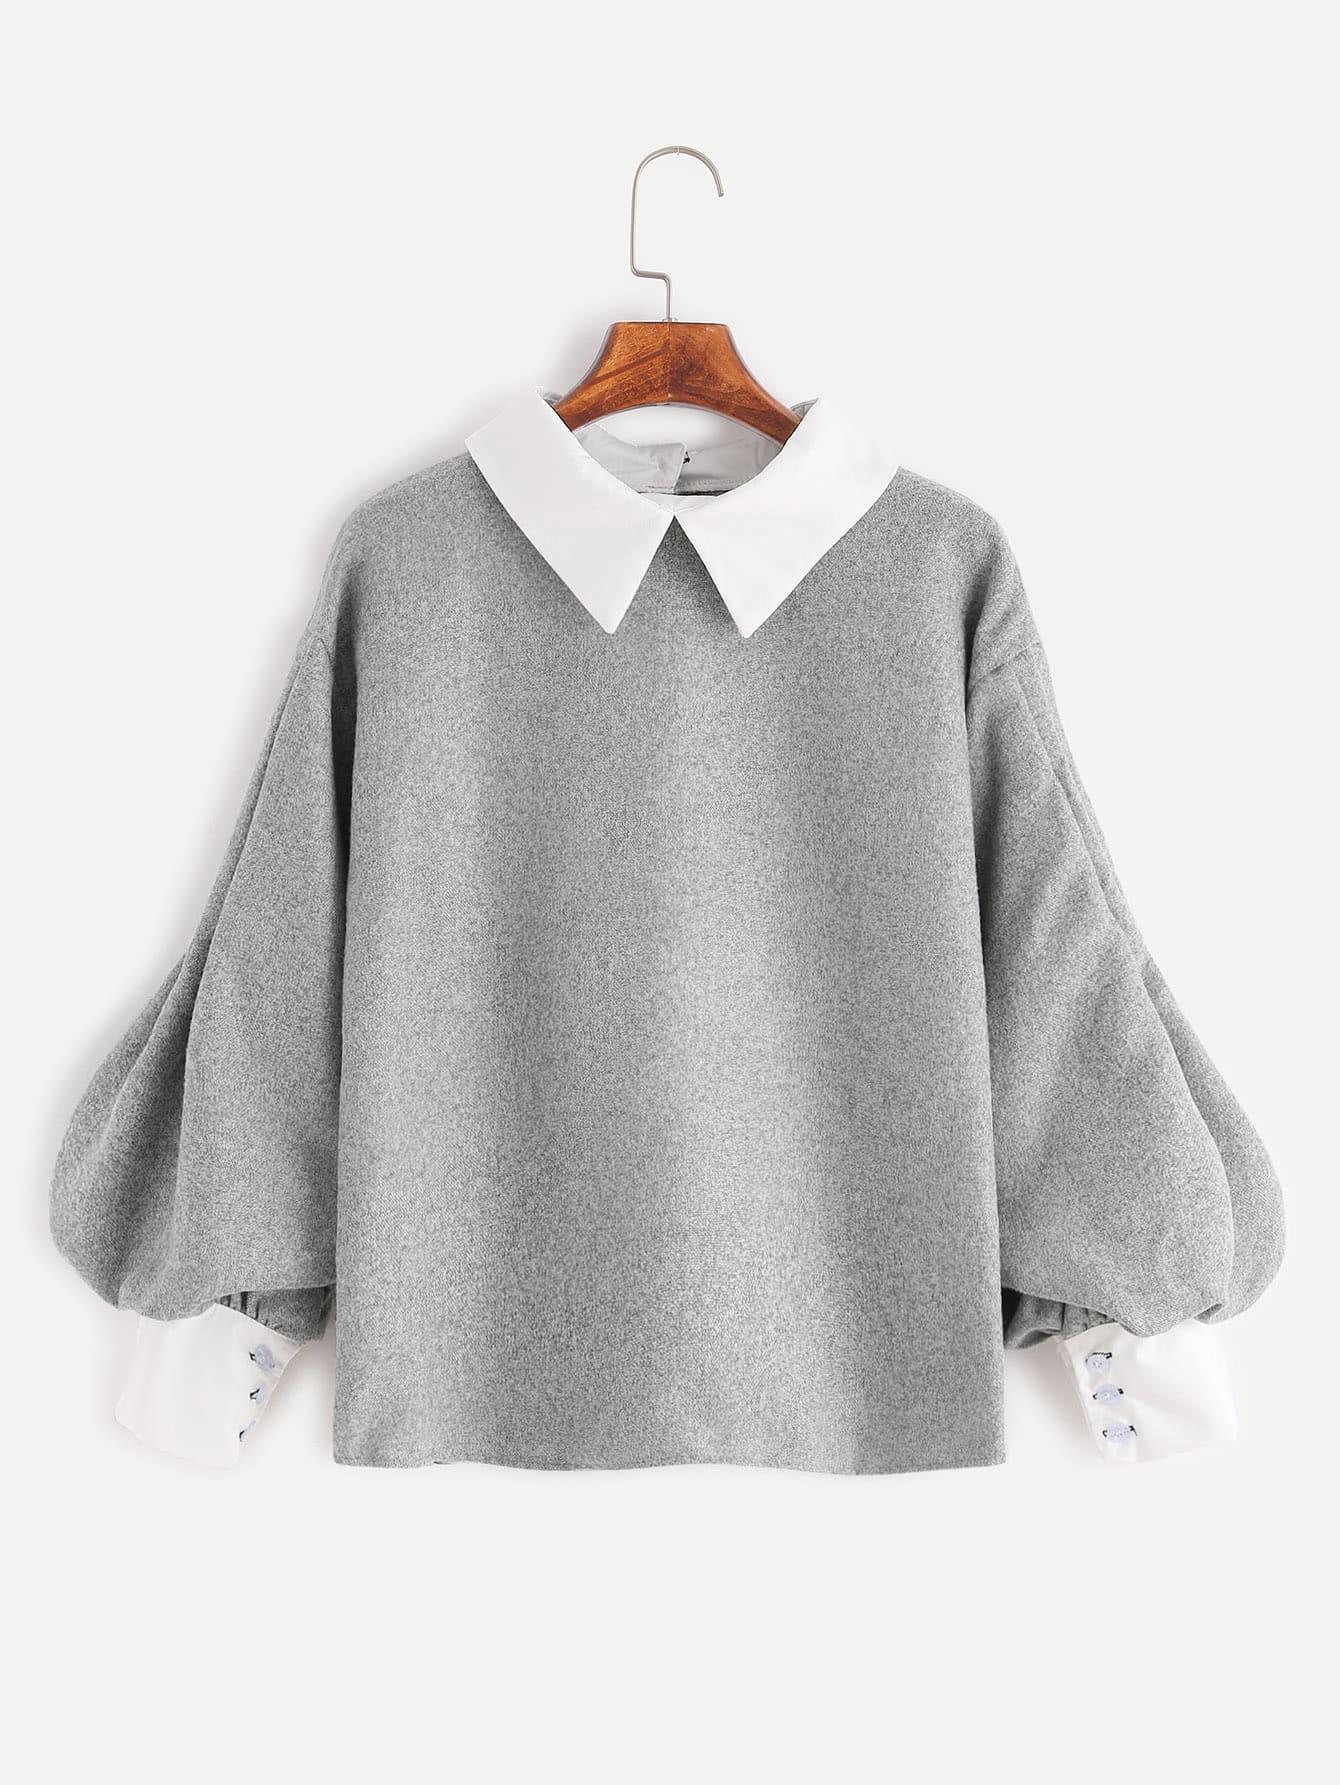 blouse161109101_2